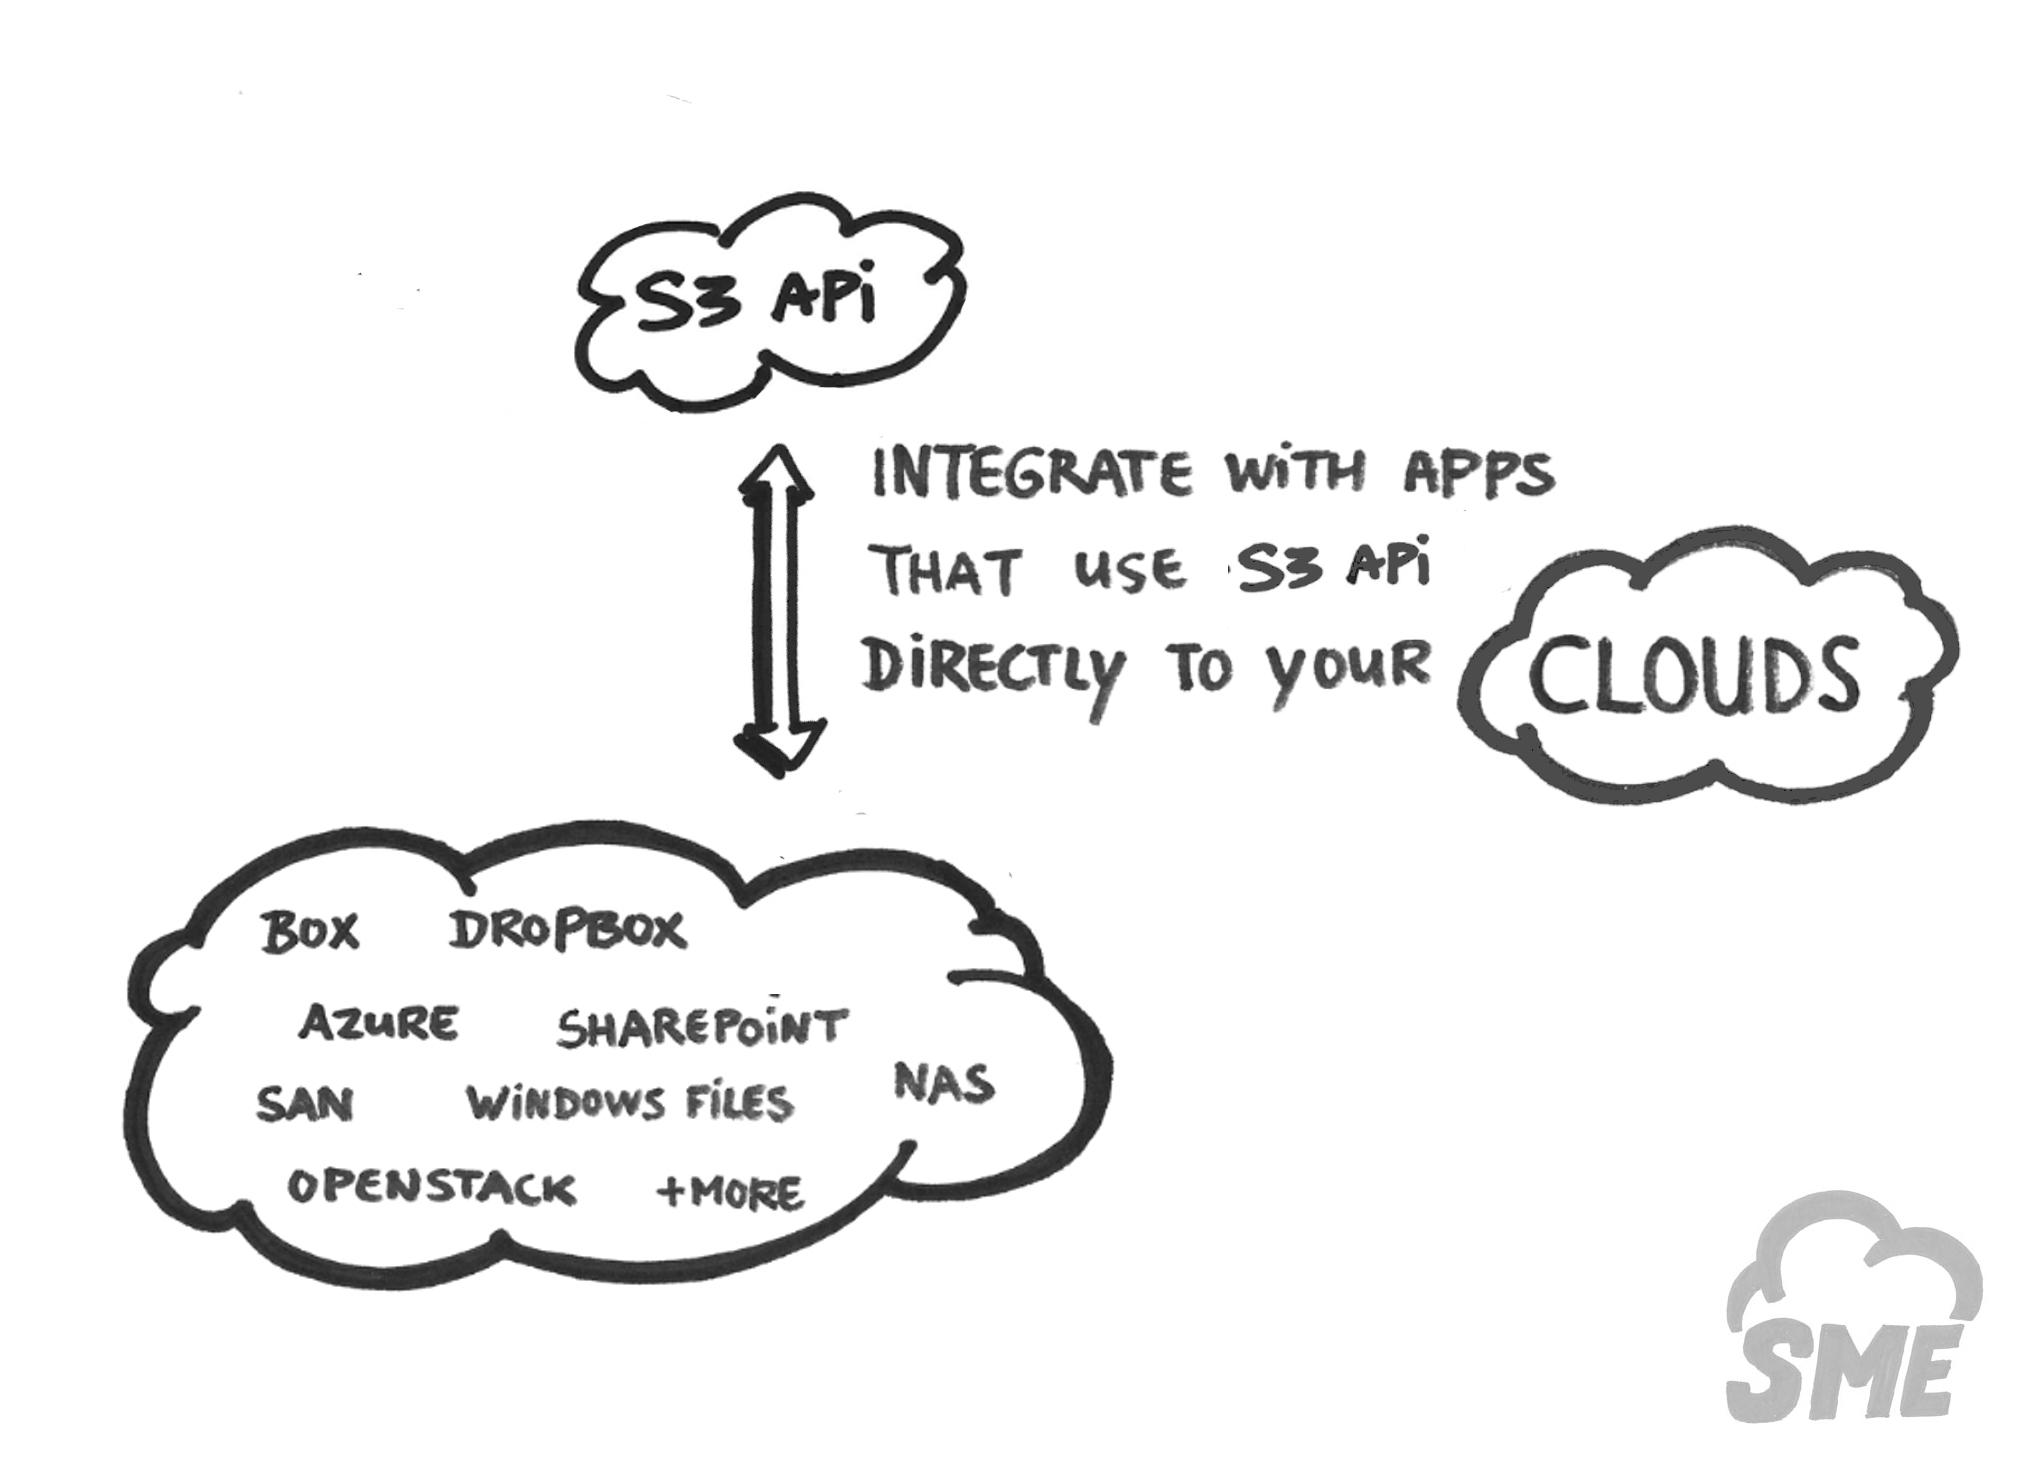 S3 API to any Cloud